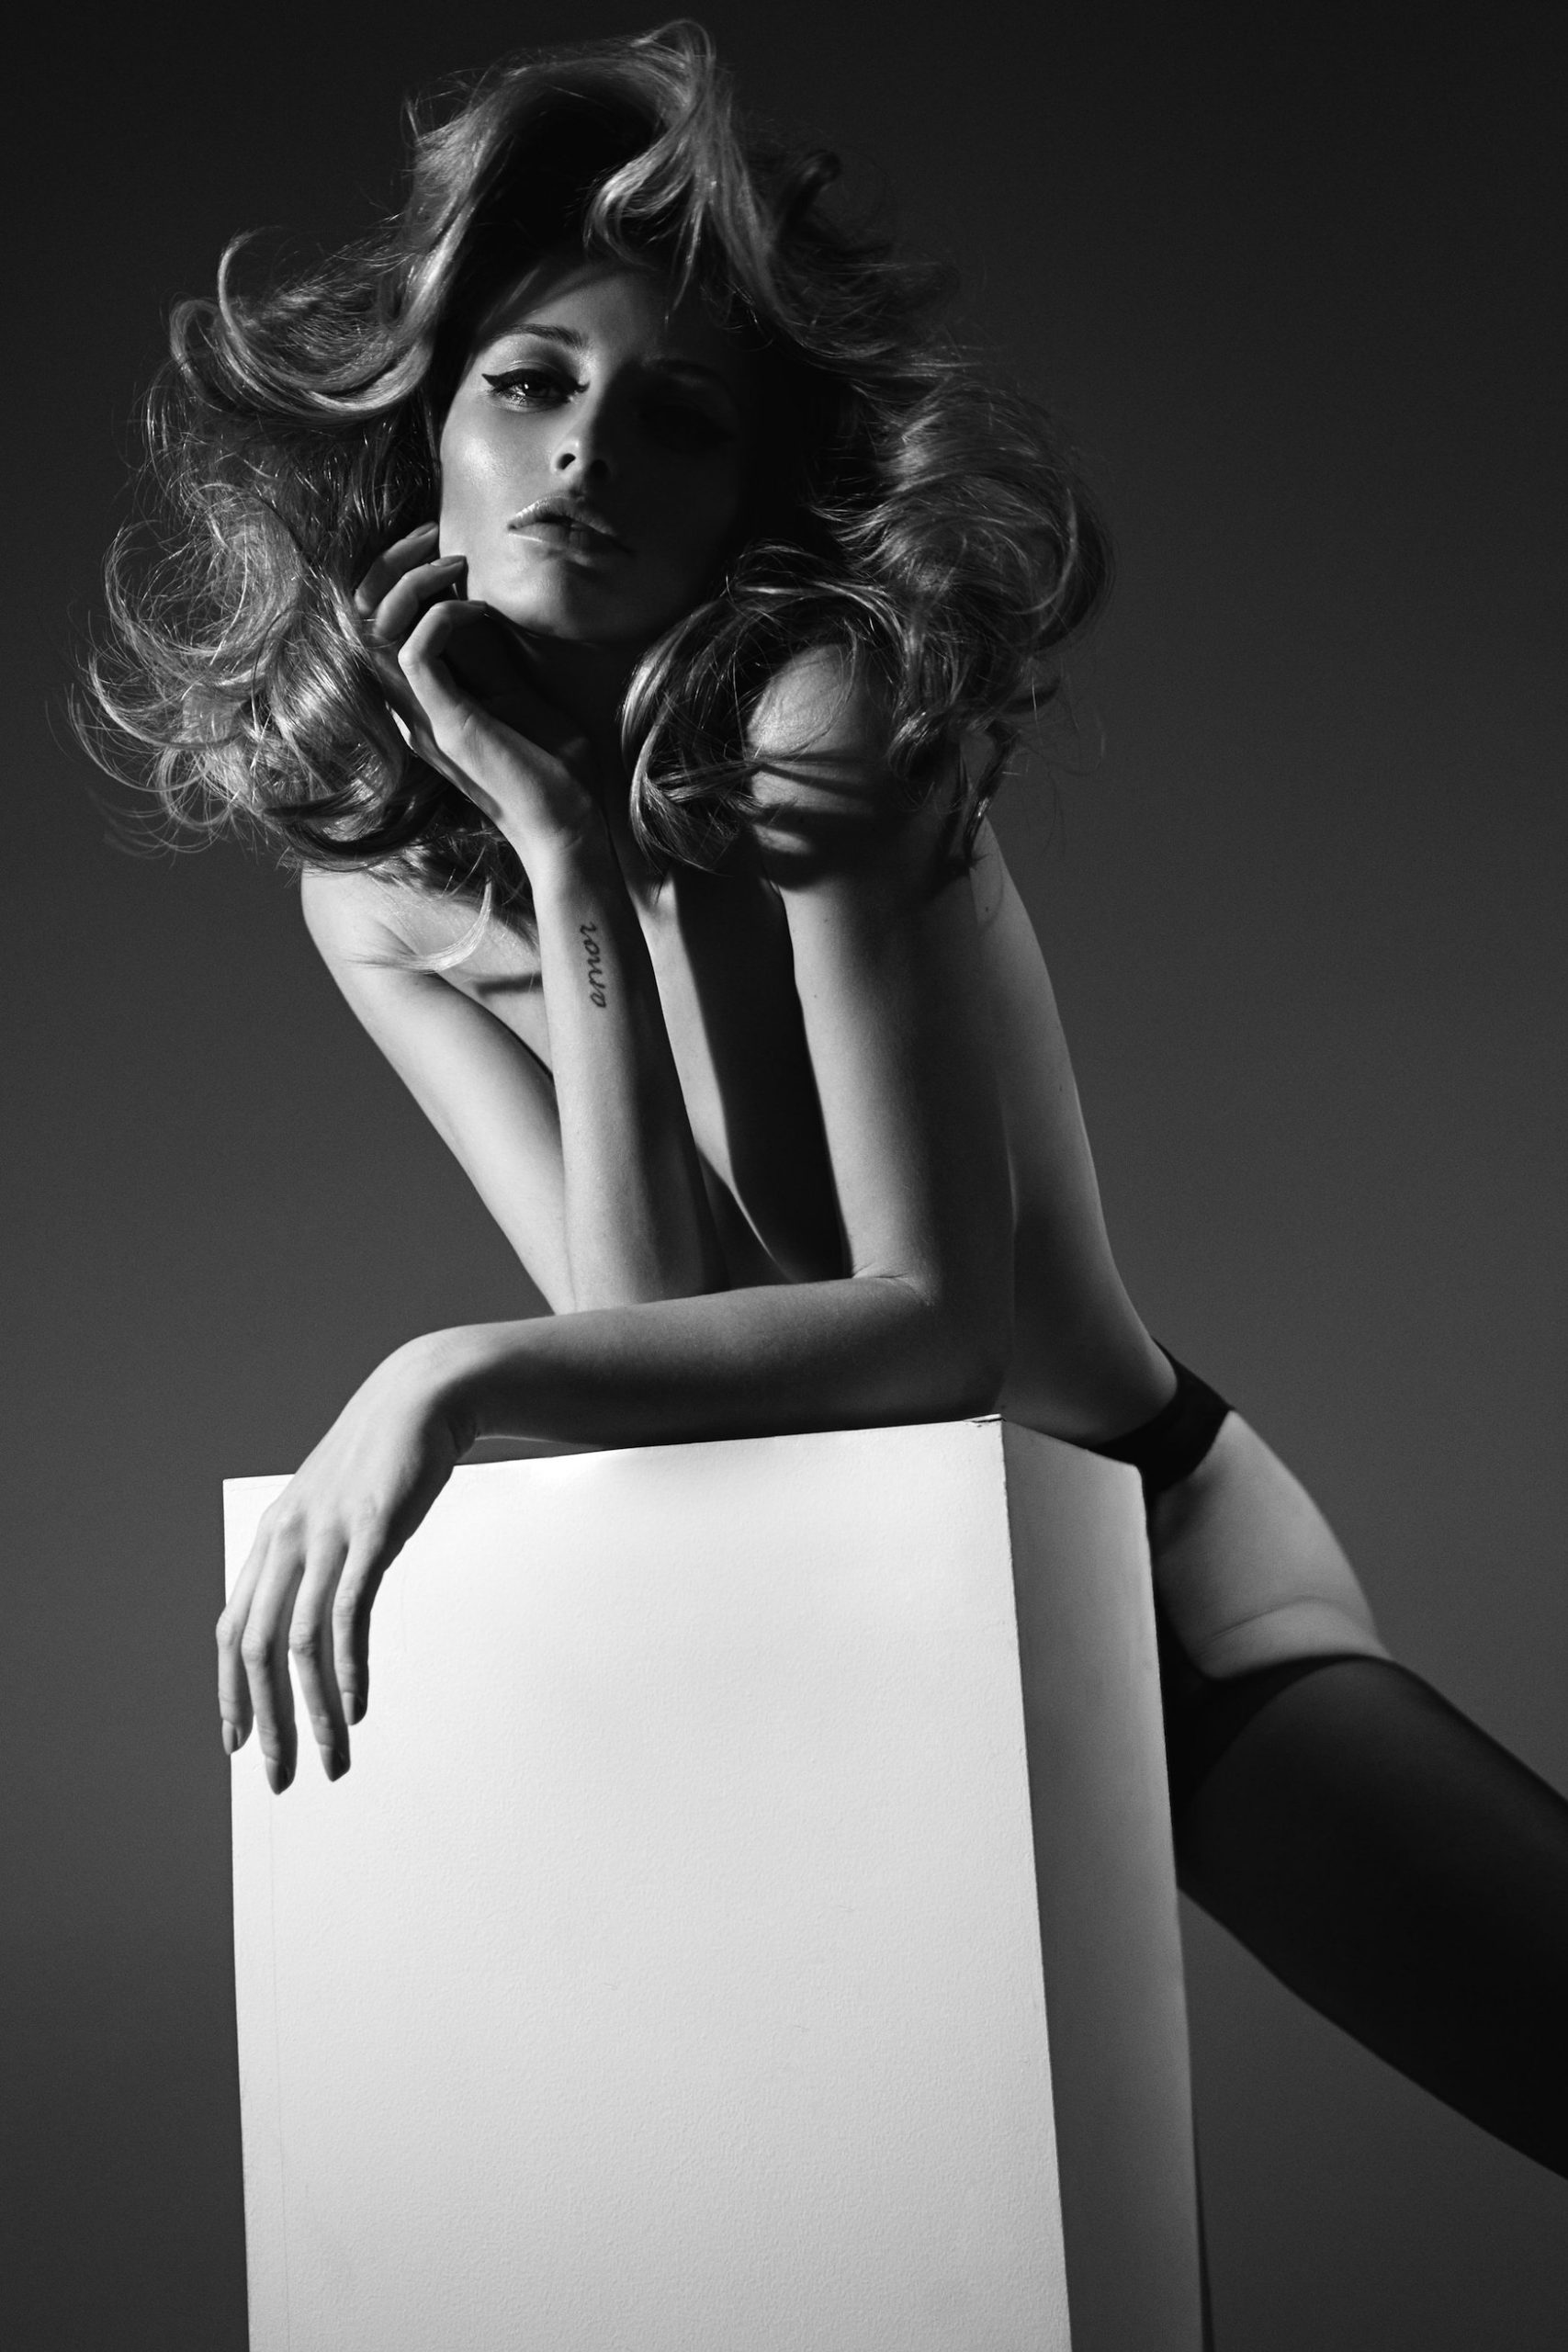 Flavia Lucini wears next-to-nothing for Leonardo Corredor.